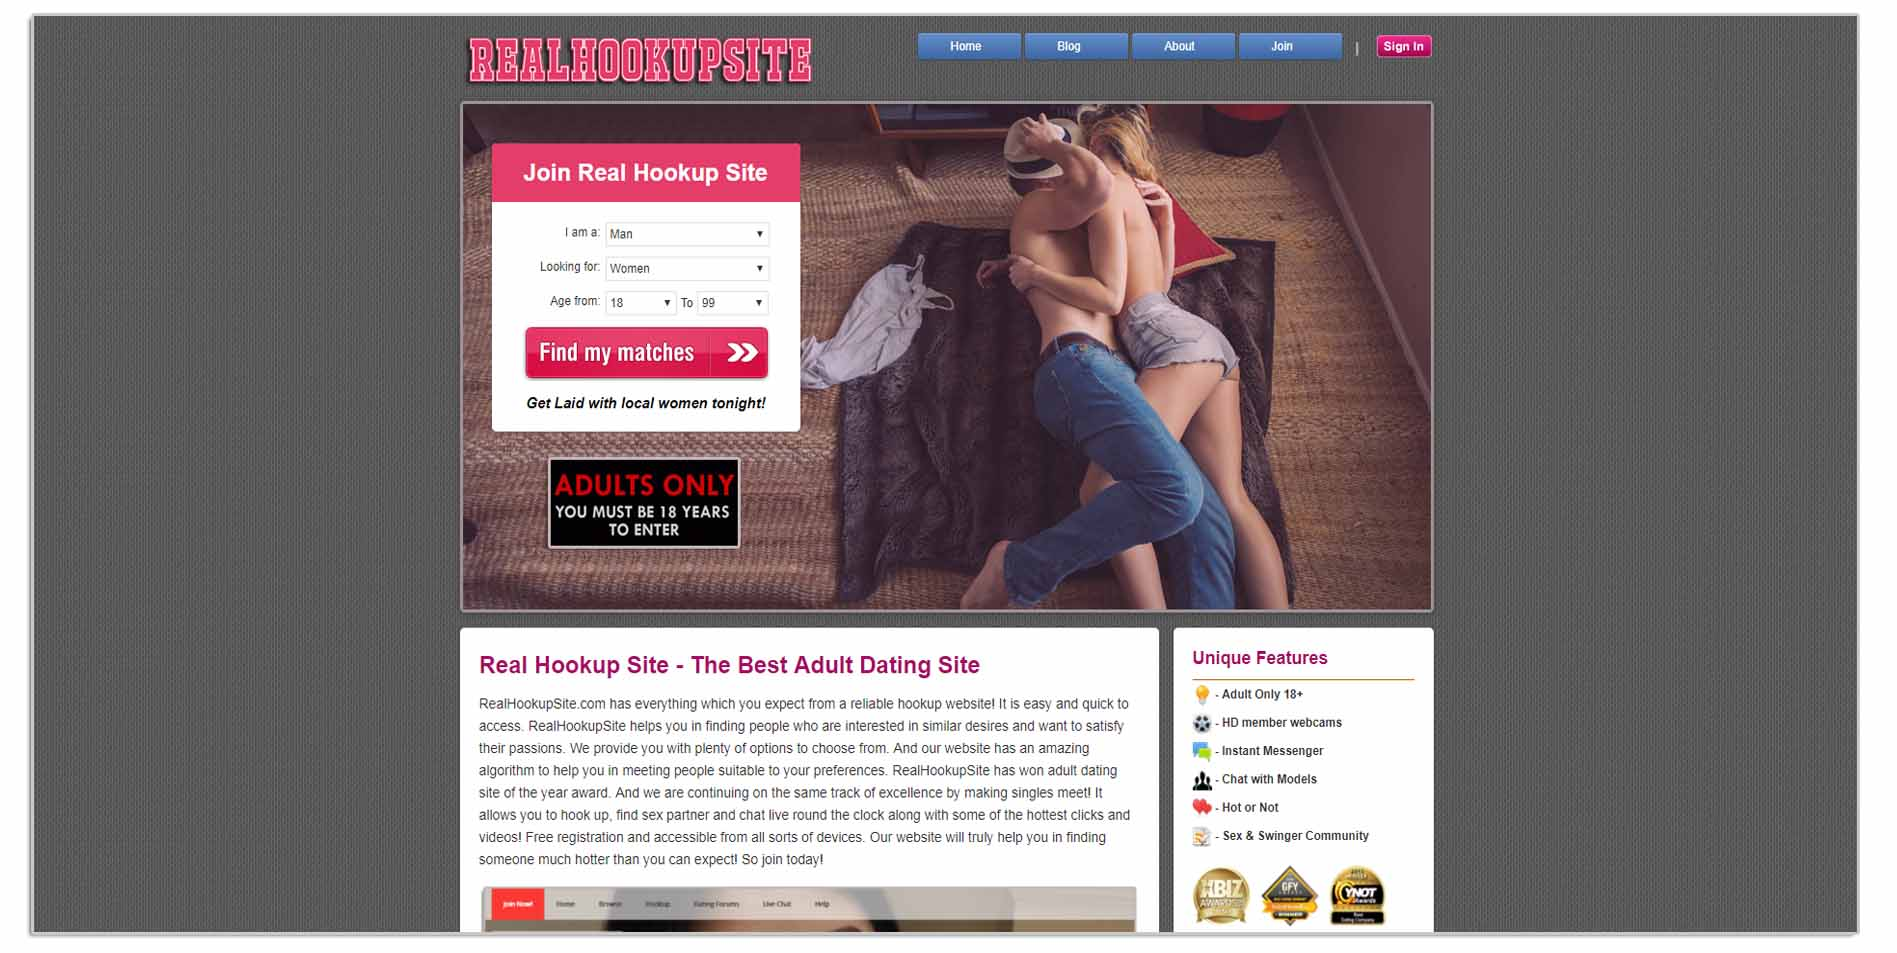 free nsa hookup apps kongsberg